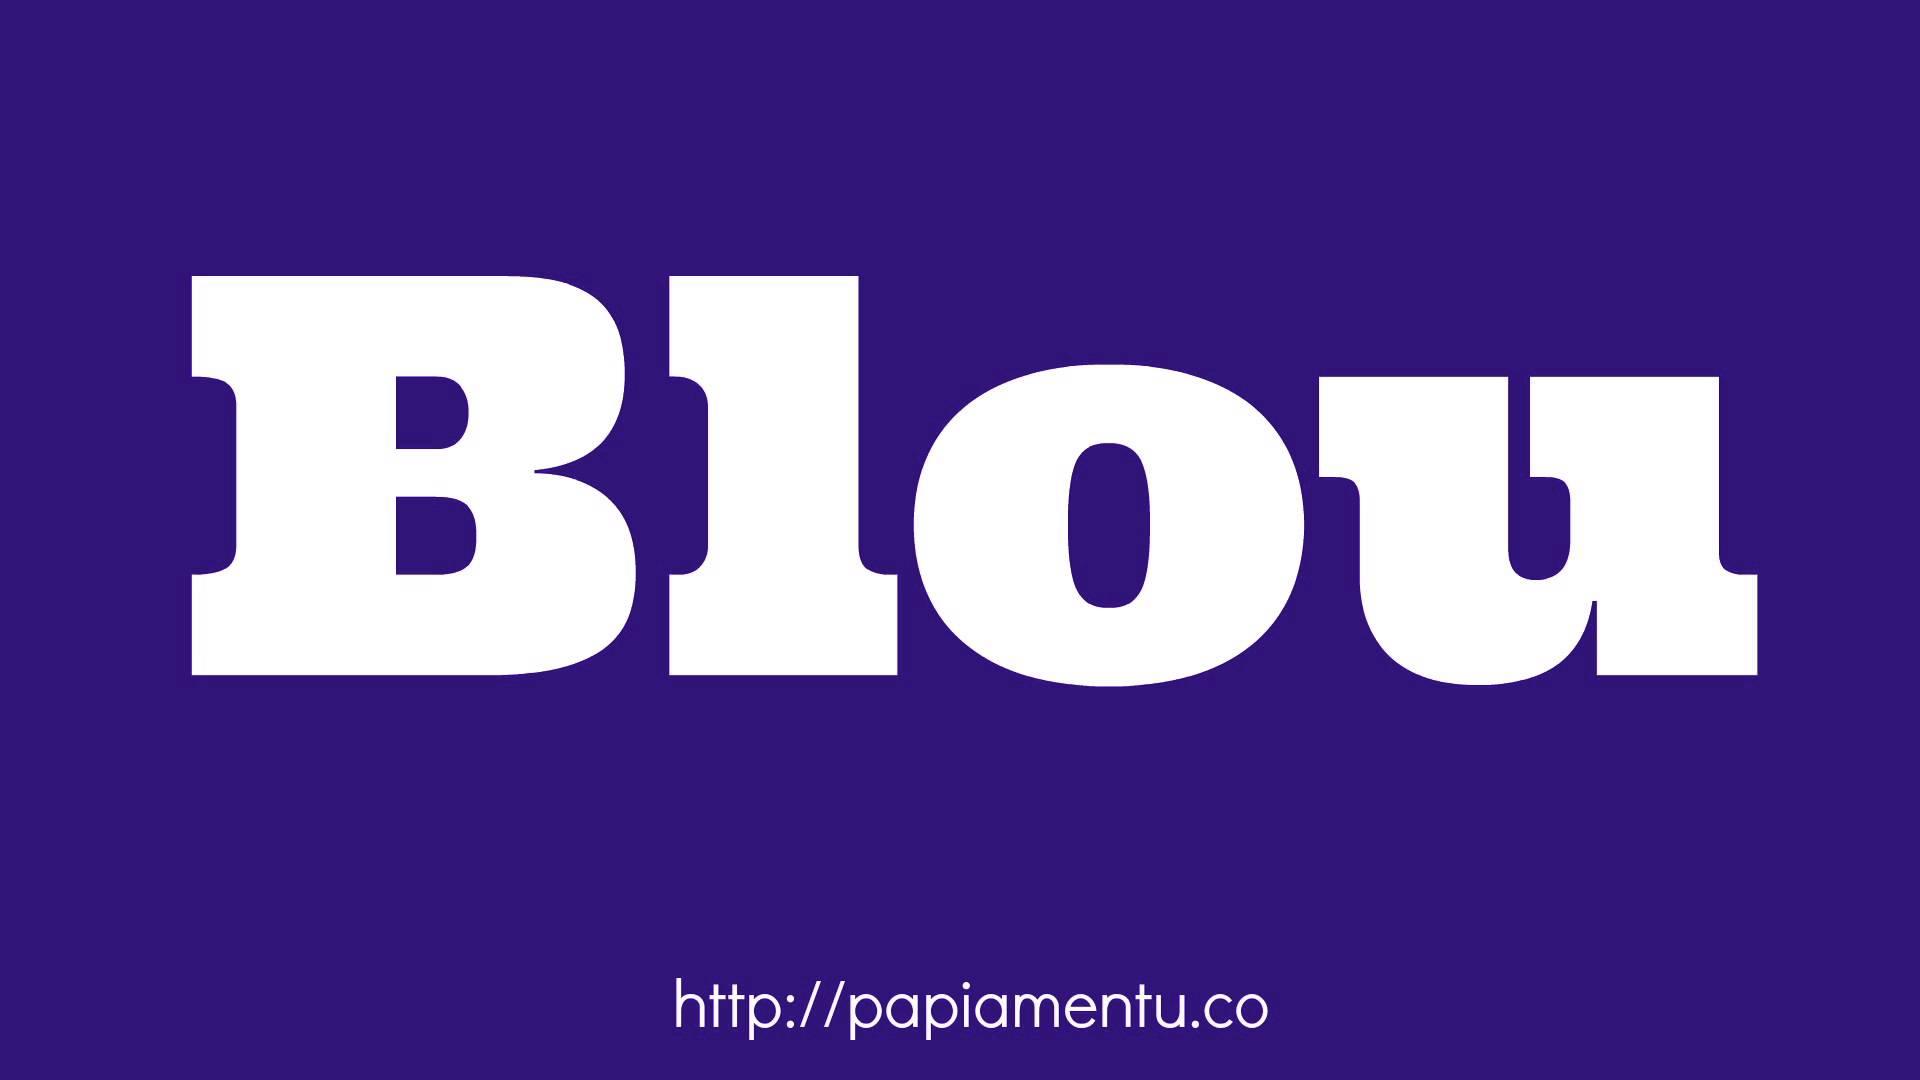 Zo zeg je Blauw in Papiamentu - Papiamentu.co